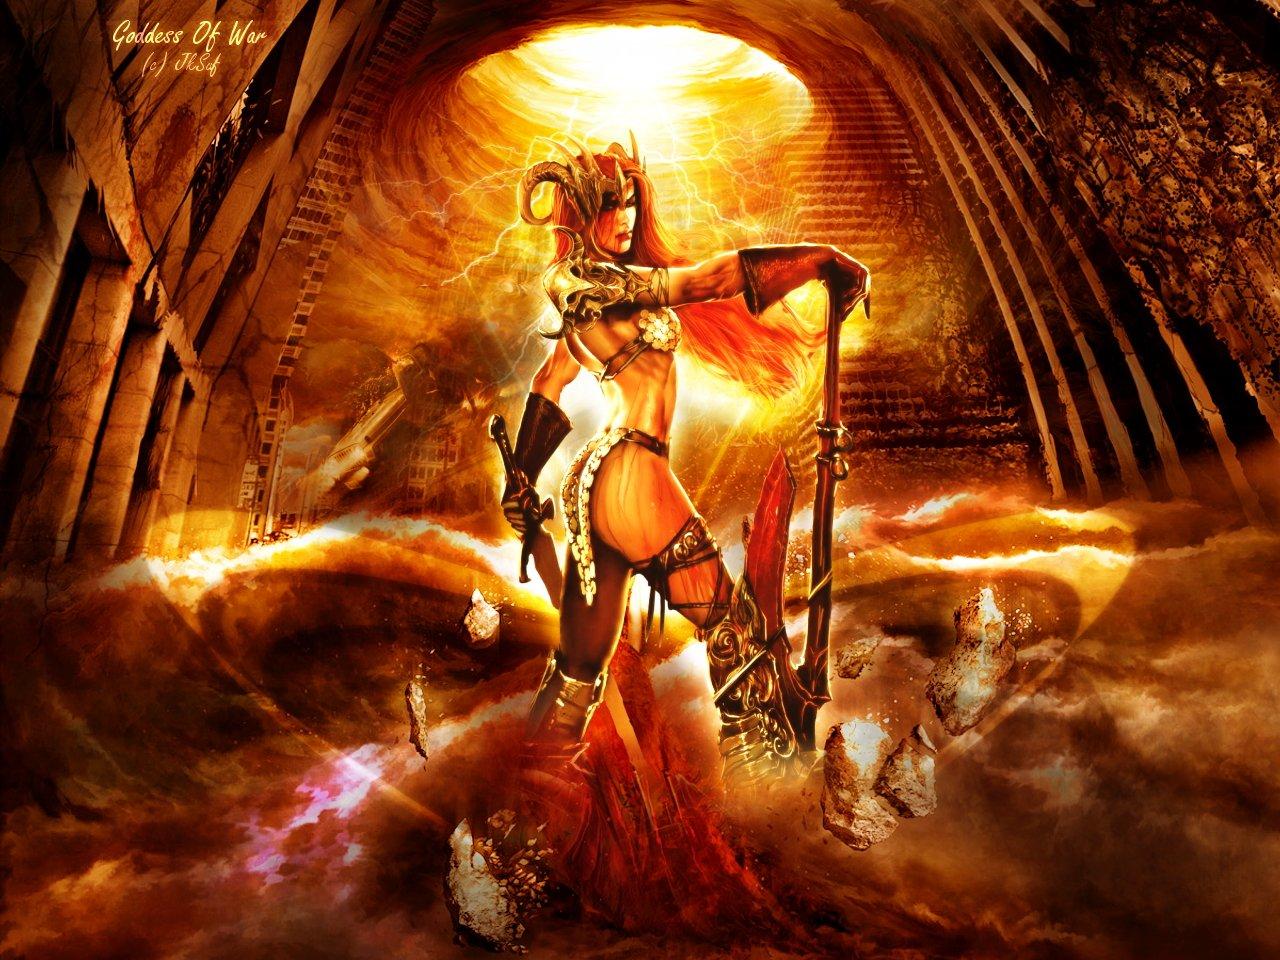 Wallpapers Fantasy and Science Fiction Gods - Goddesses Goddess of War